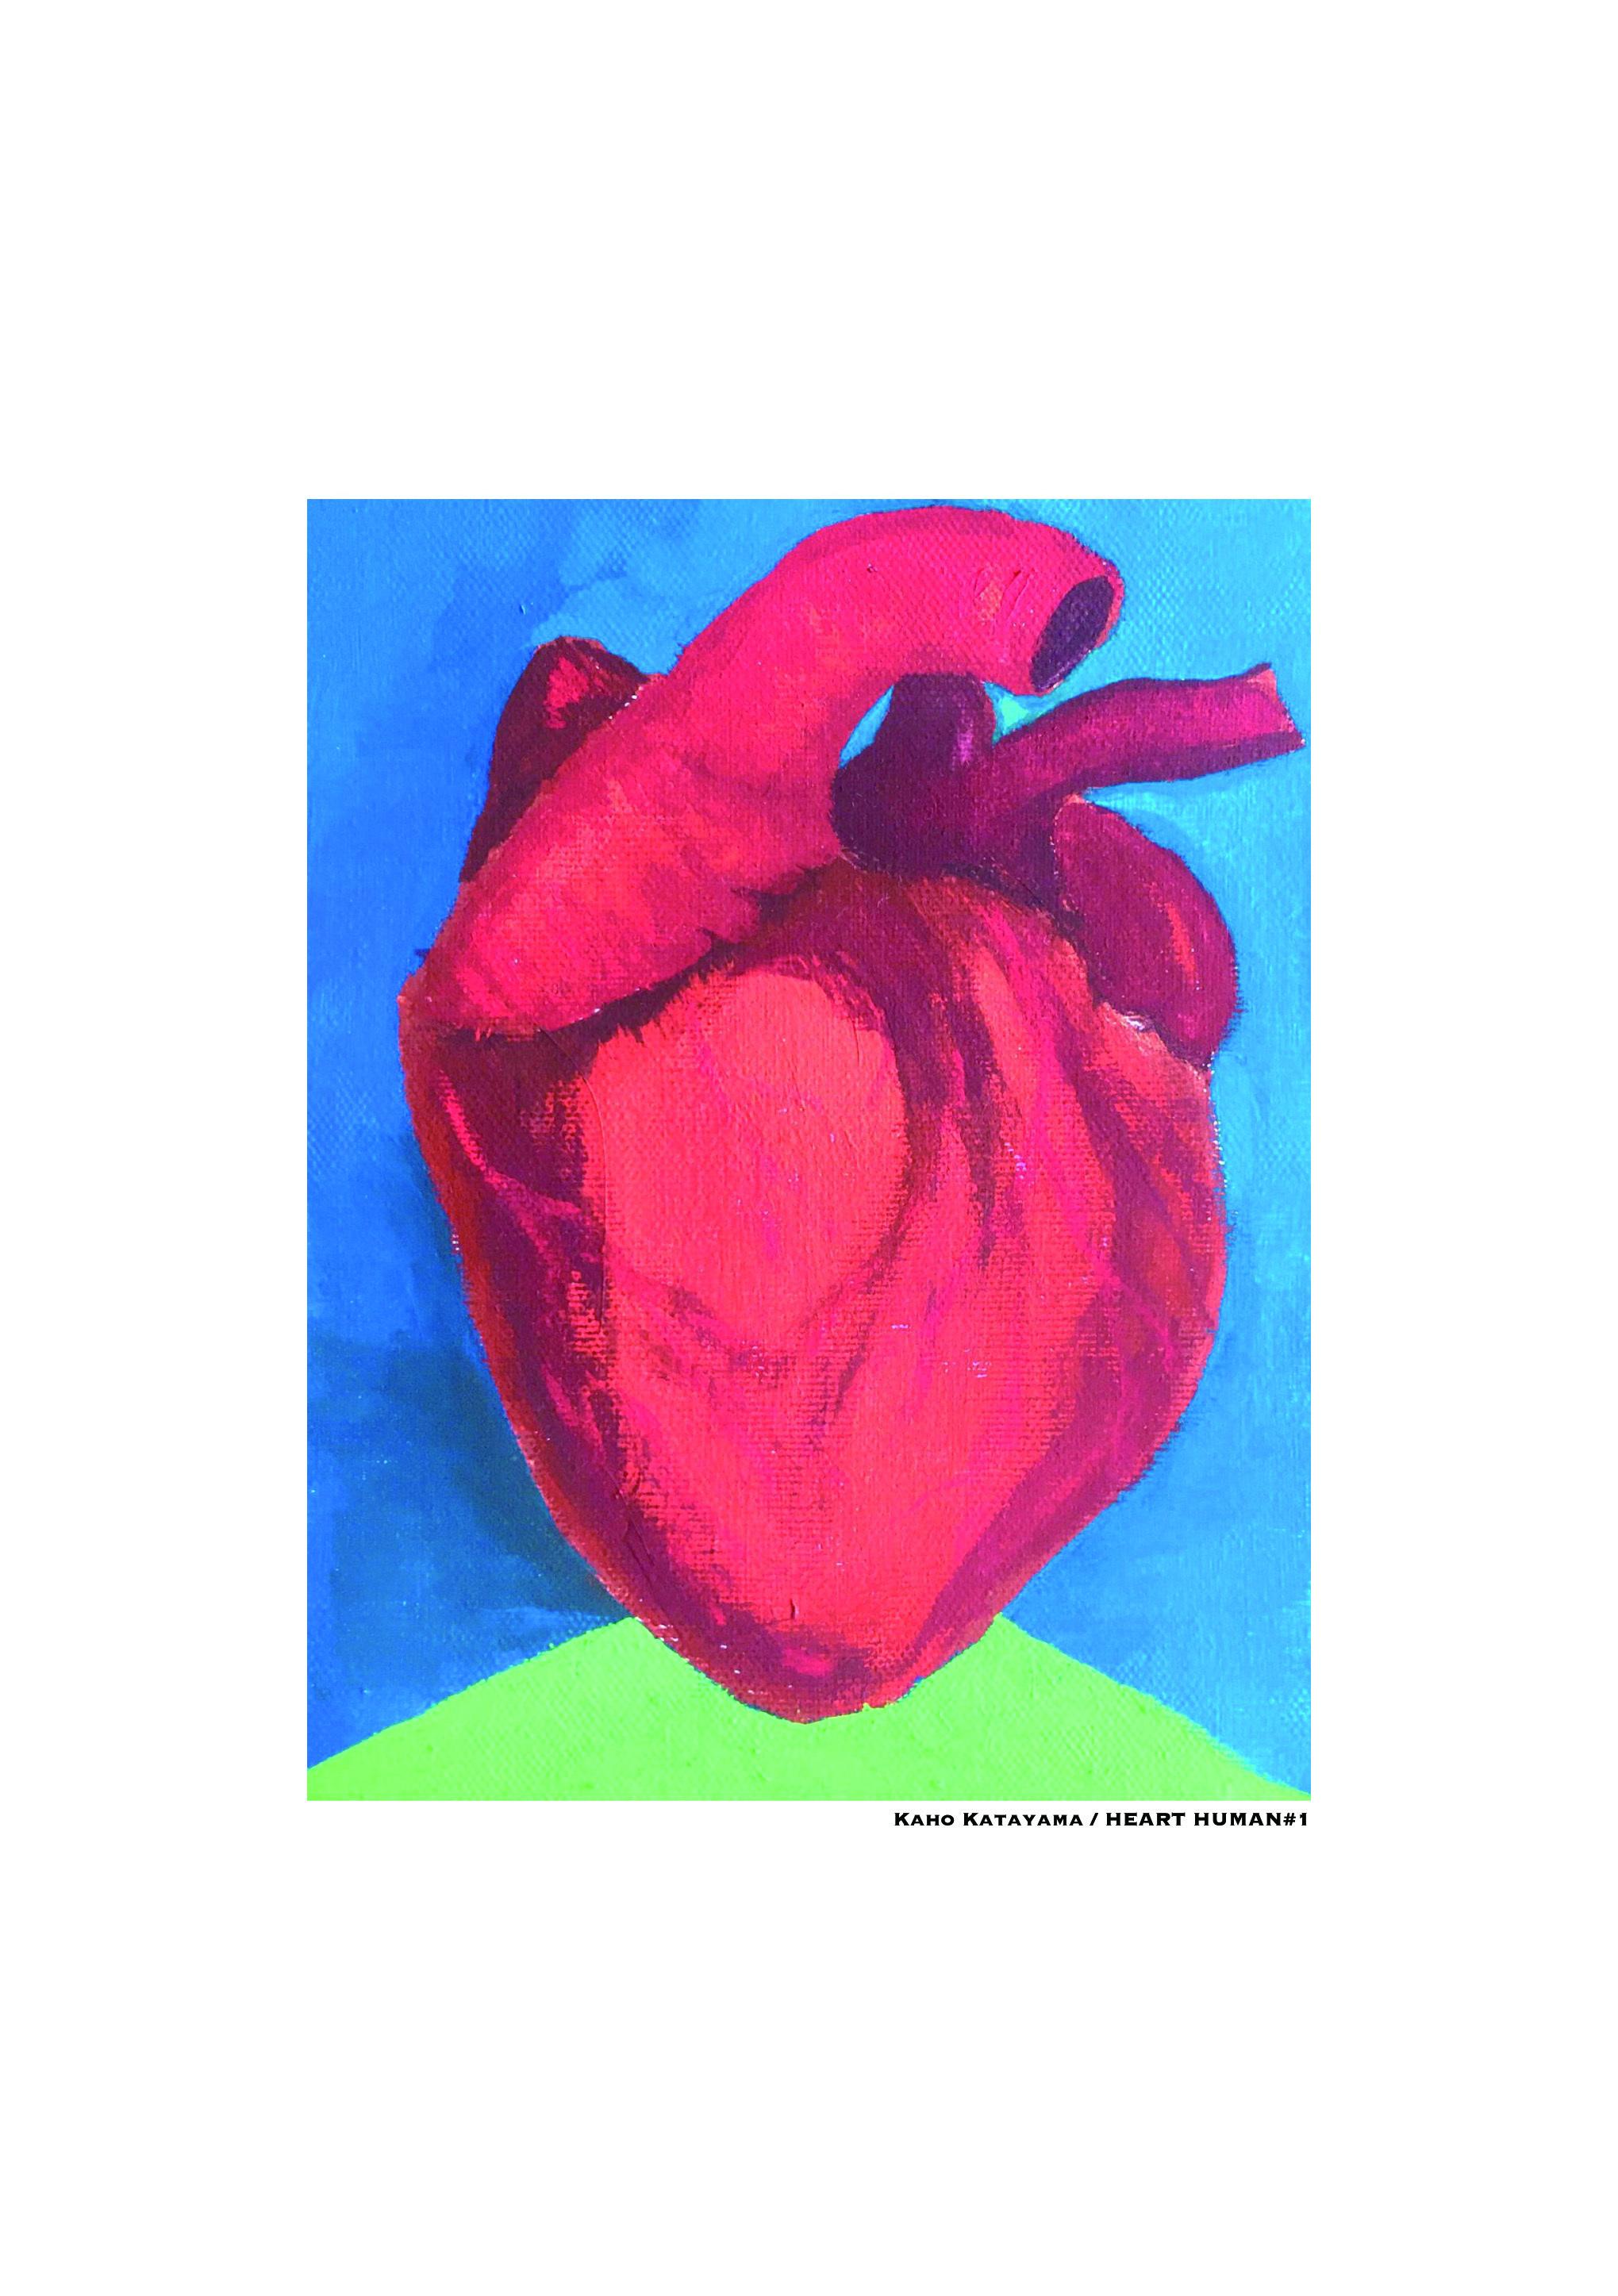 HEART HUMAN #1/18cm×14cm/Acrylic painting/ Original picture